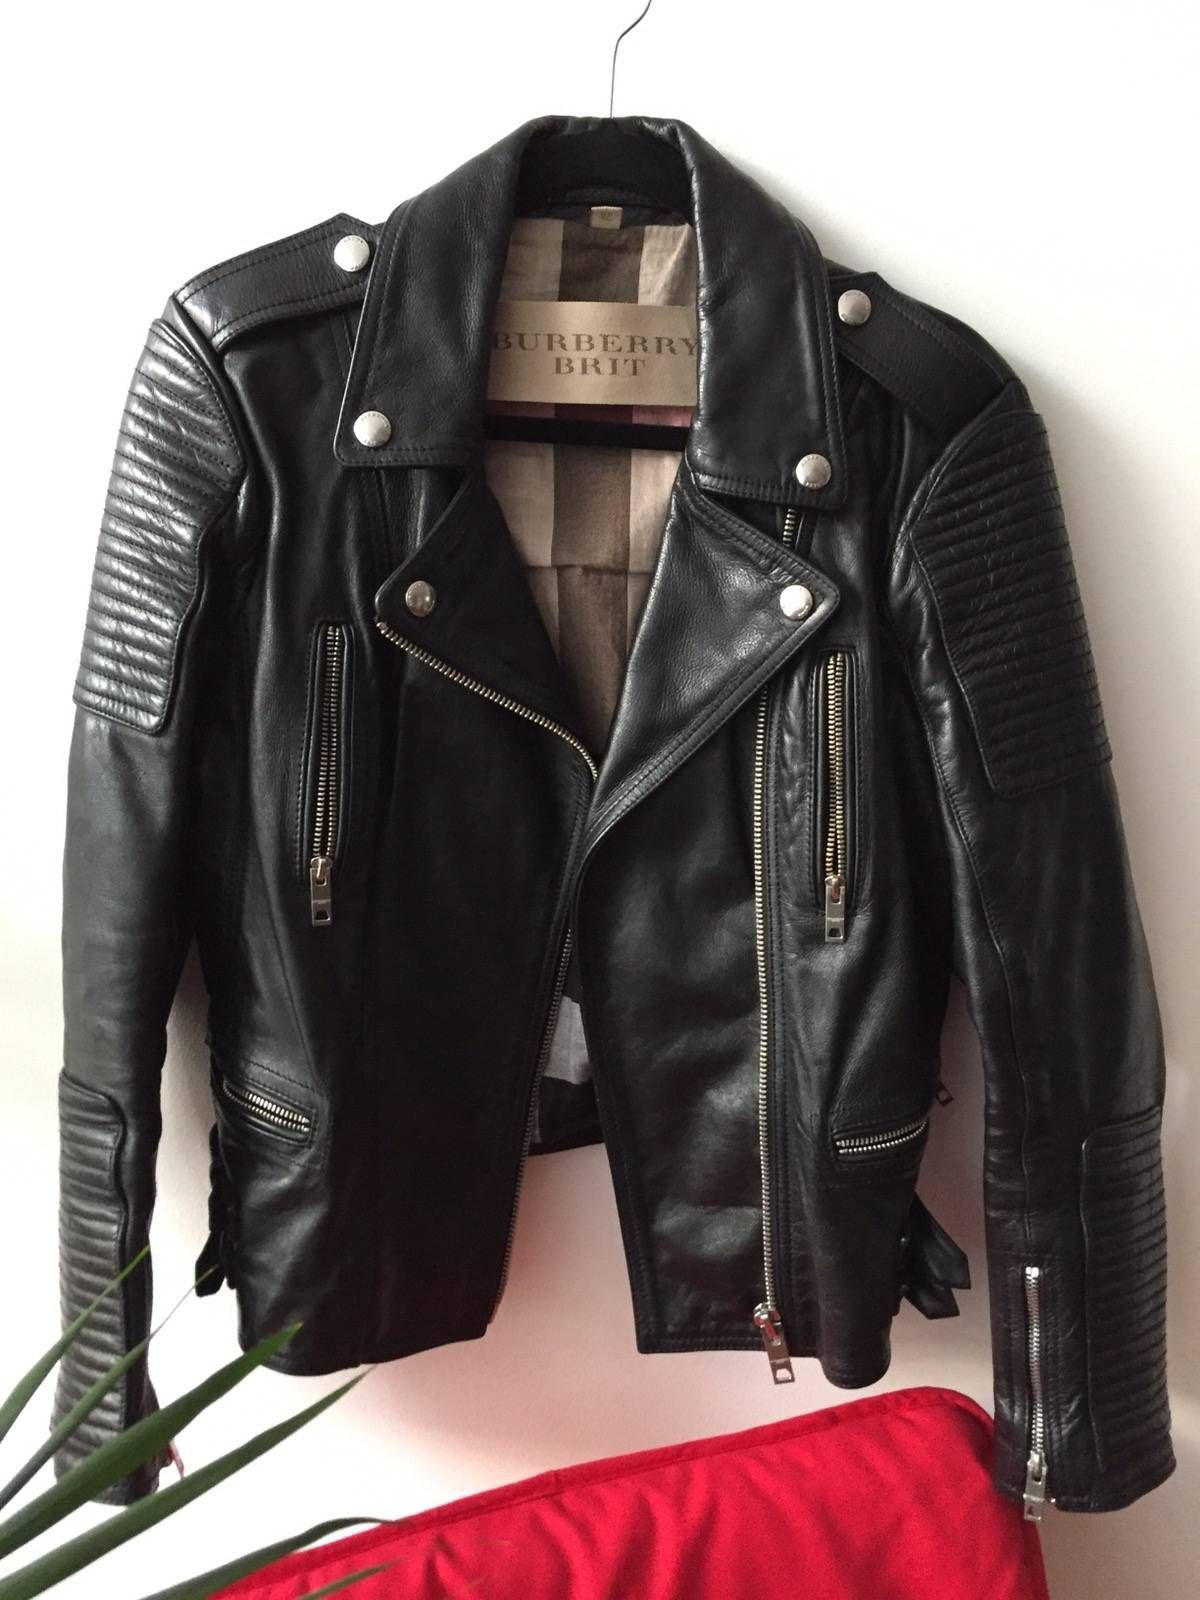 39cdca42 Buy Burberry Prorsum Motorcycle Biker Jacket, Size: S, Description:  Burberry Brit leather motorcycle jacketFits like Size 46 men's/size 44  women's.